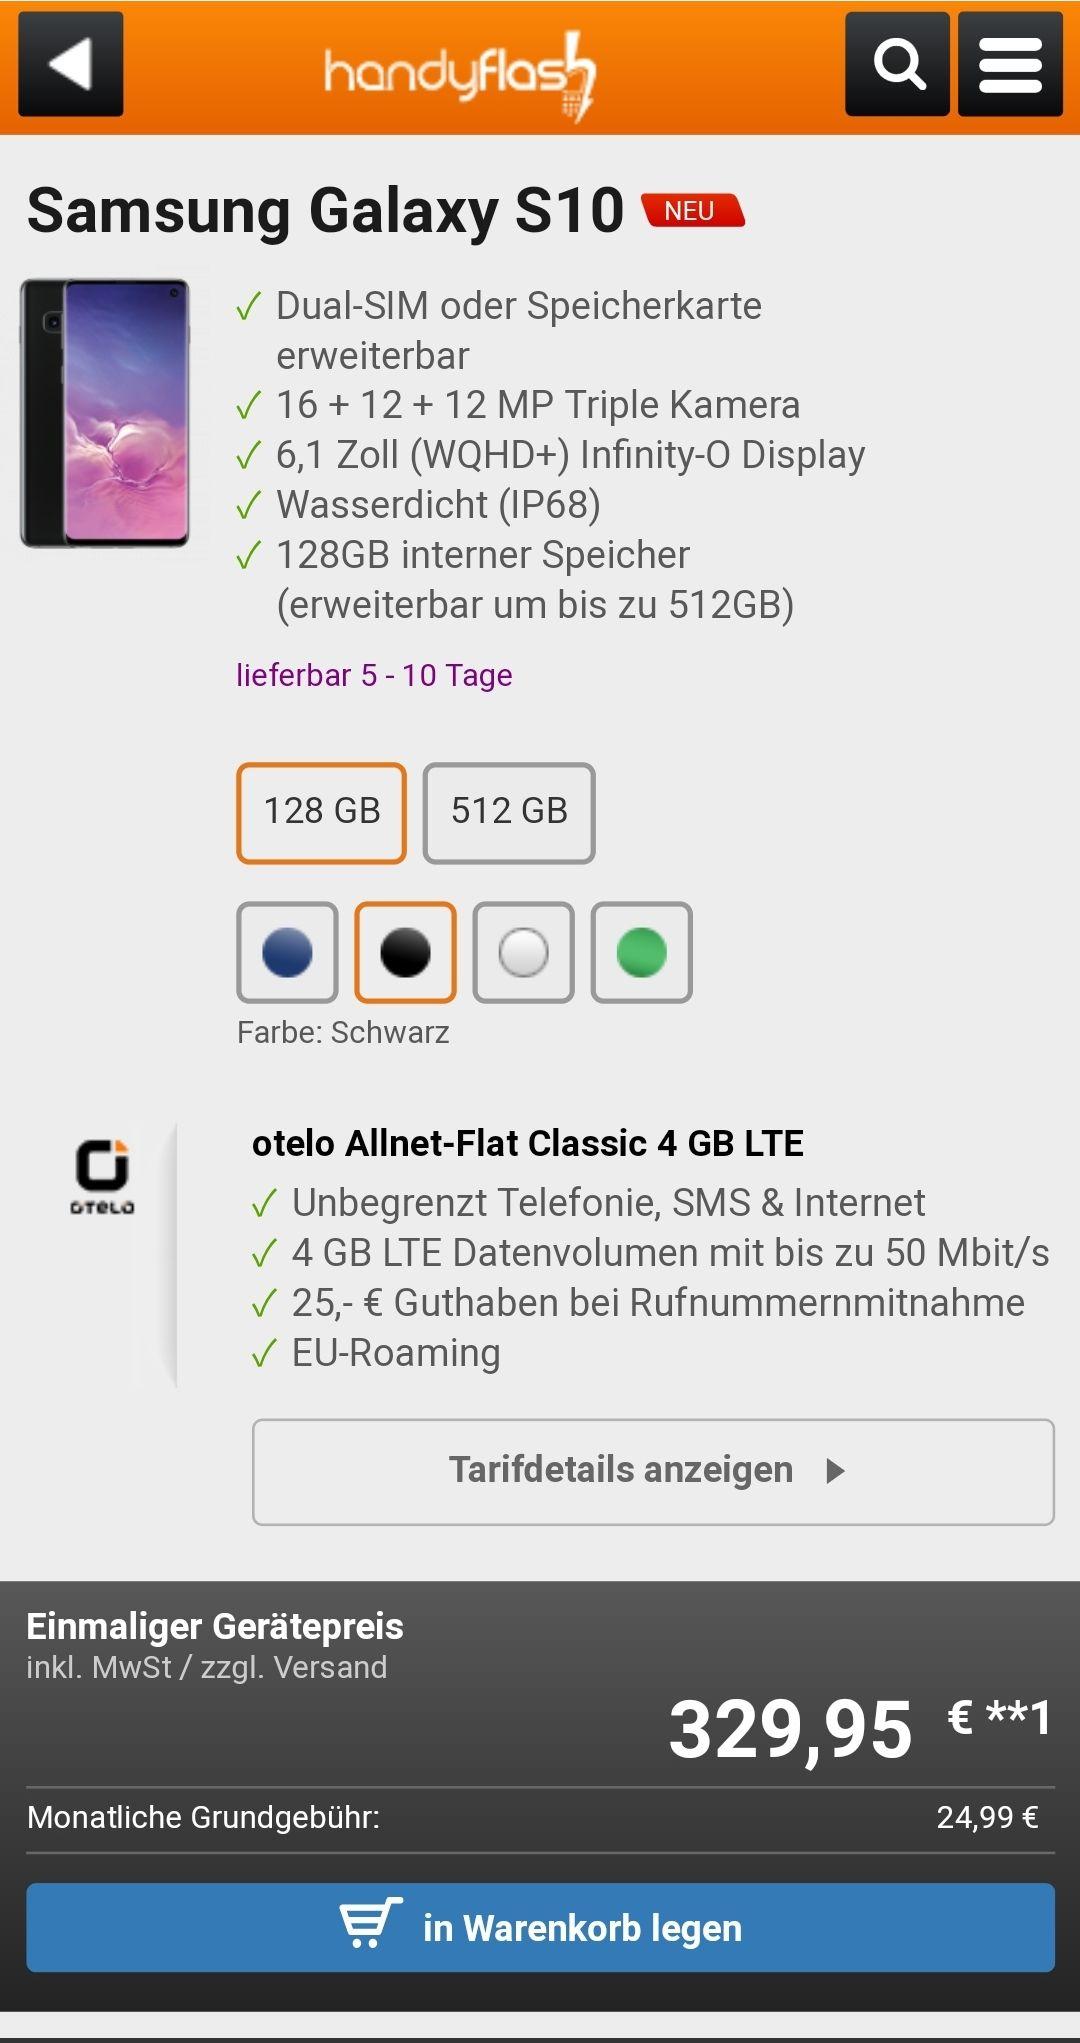 Samsung Galaxy S10 Otelo Allnet Flat Classic 4GB LTE/Young 6 GB- 949,71€ 6 GB/Young 12 GB